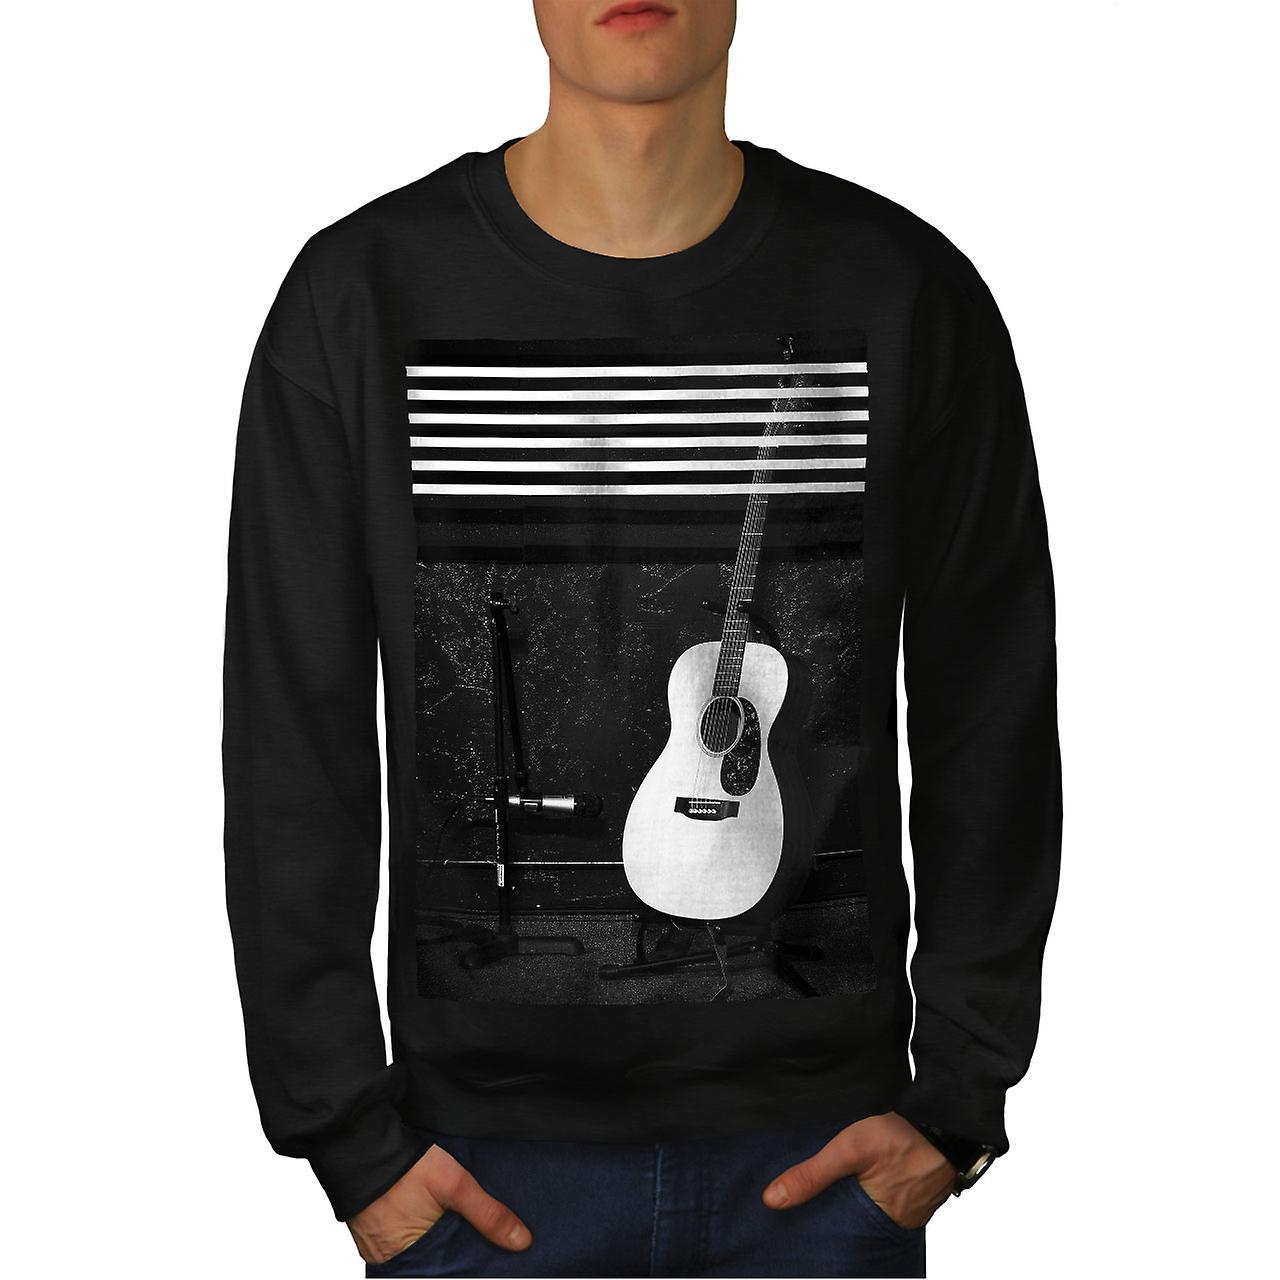 acoustic guitar men blacksweatshirt wellcoda fruugo. Black Bedroom Furniture Sets. Home Design Ideas